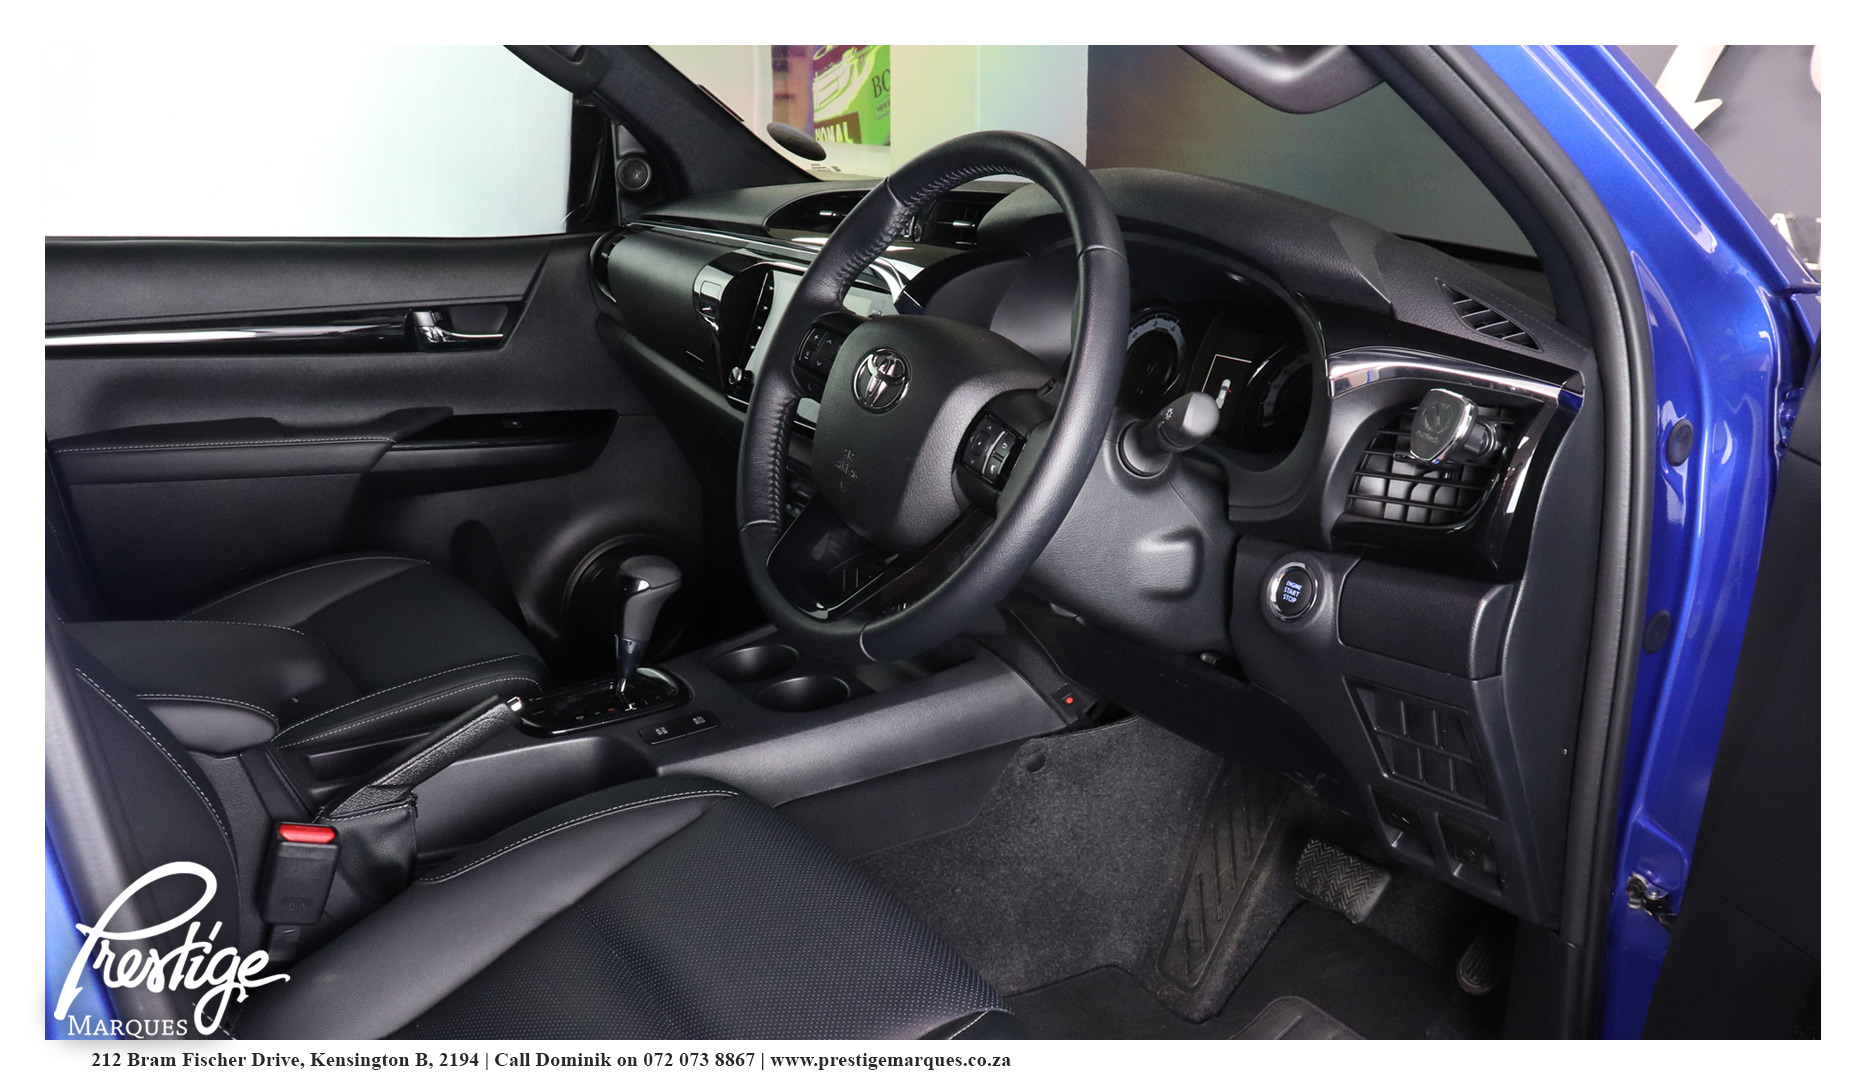 2020-Toyota-Hilux-2X2-50-Legened-Auto-Prestige-Marques-Randburg-Sandton-11